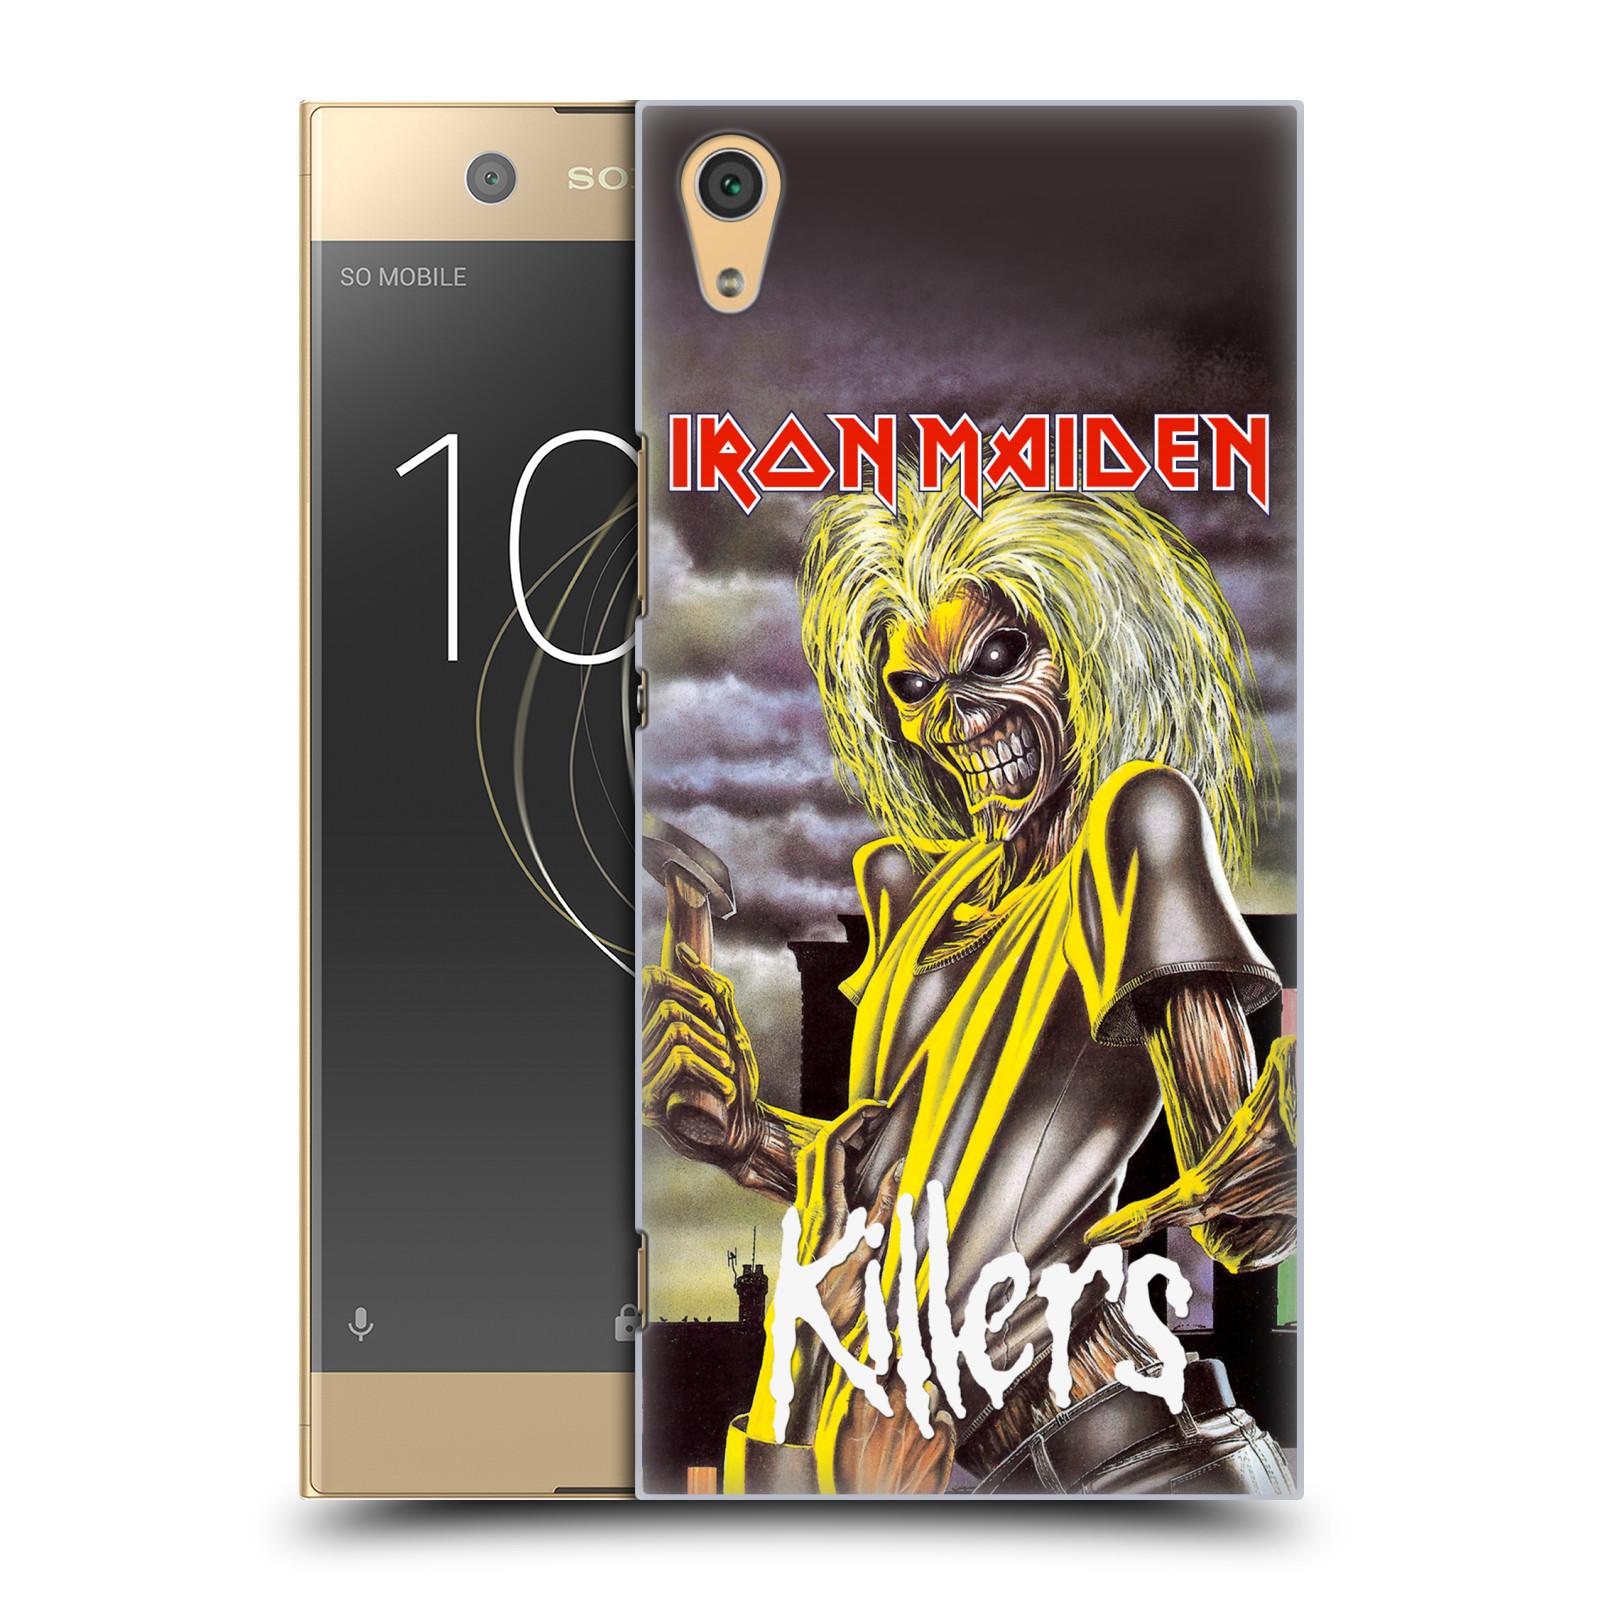 Plastové pouzdro na mobil Sony Xperia XA1 Ultra - Head Case - Iron Maiden - Killers